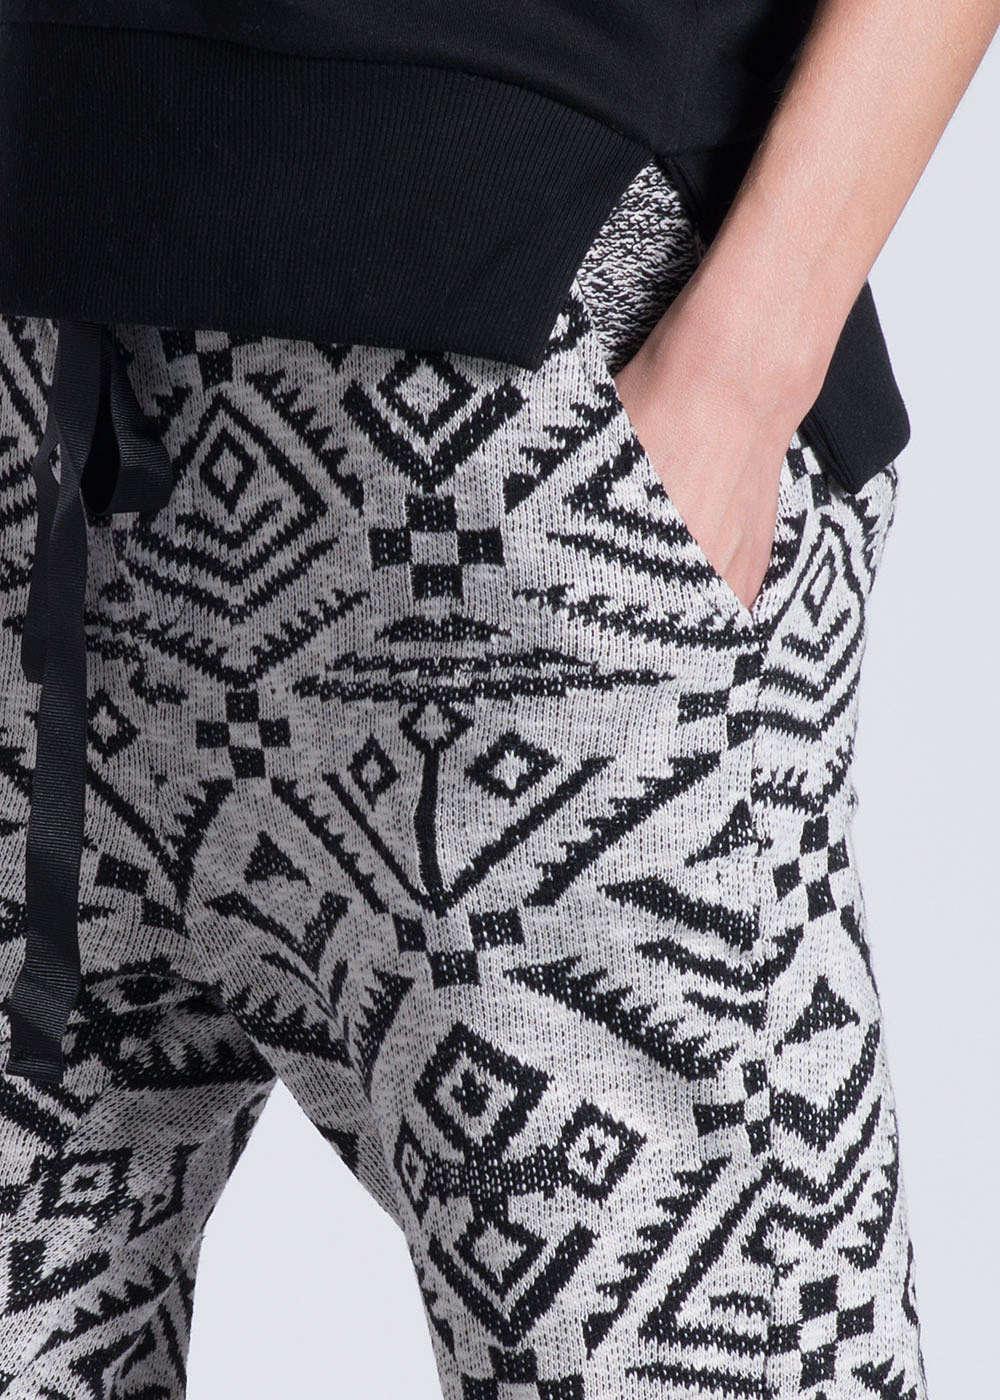 eight2nine damen sweatpant 2 taschen kordelzug ethno muster weiss schwarz ebay. Black Bedroom Furniture Sets. Home Design Ideas